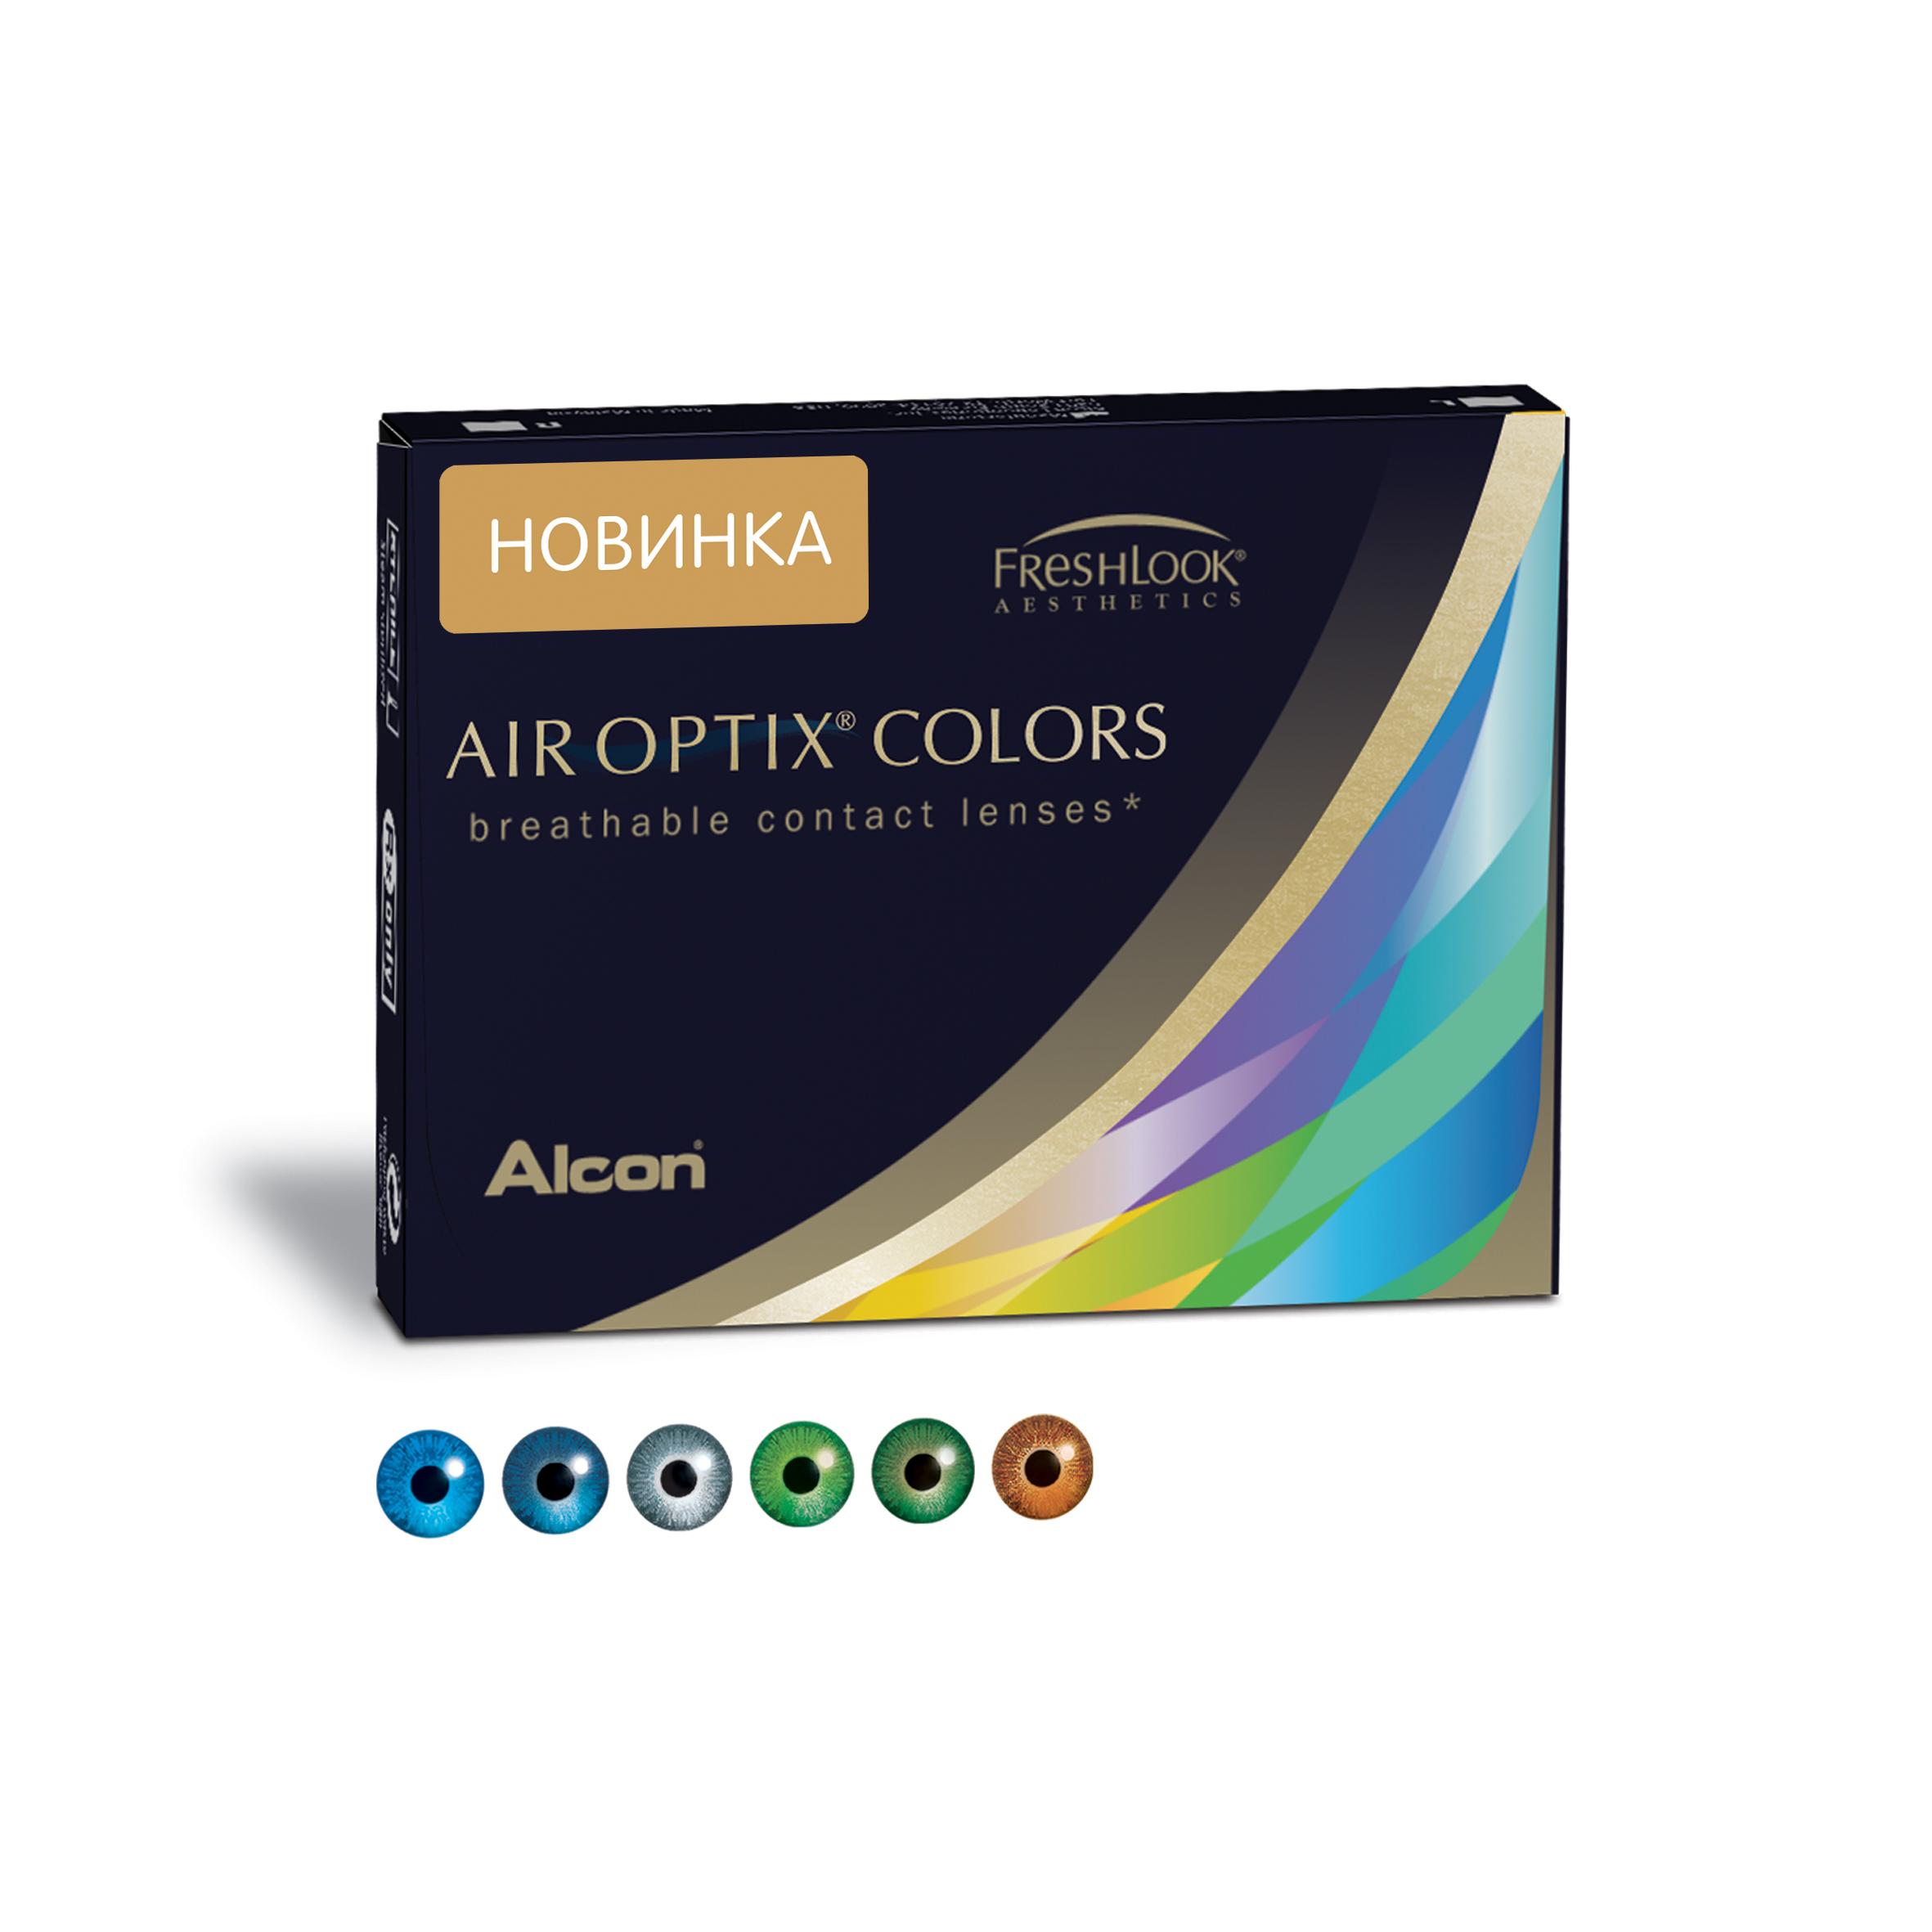 Аlcon контактные линзы Air Optix Colors 2 шт -5.75 Brilliant Blue31746293Мягкие контактные линзы